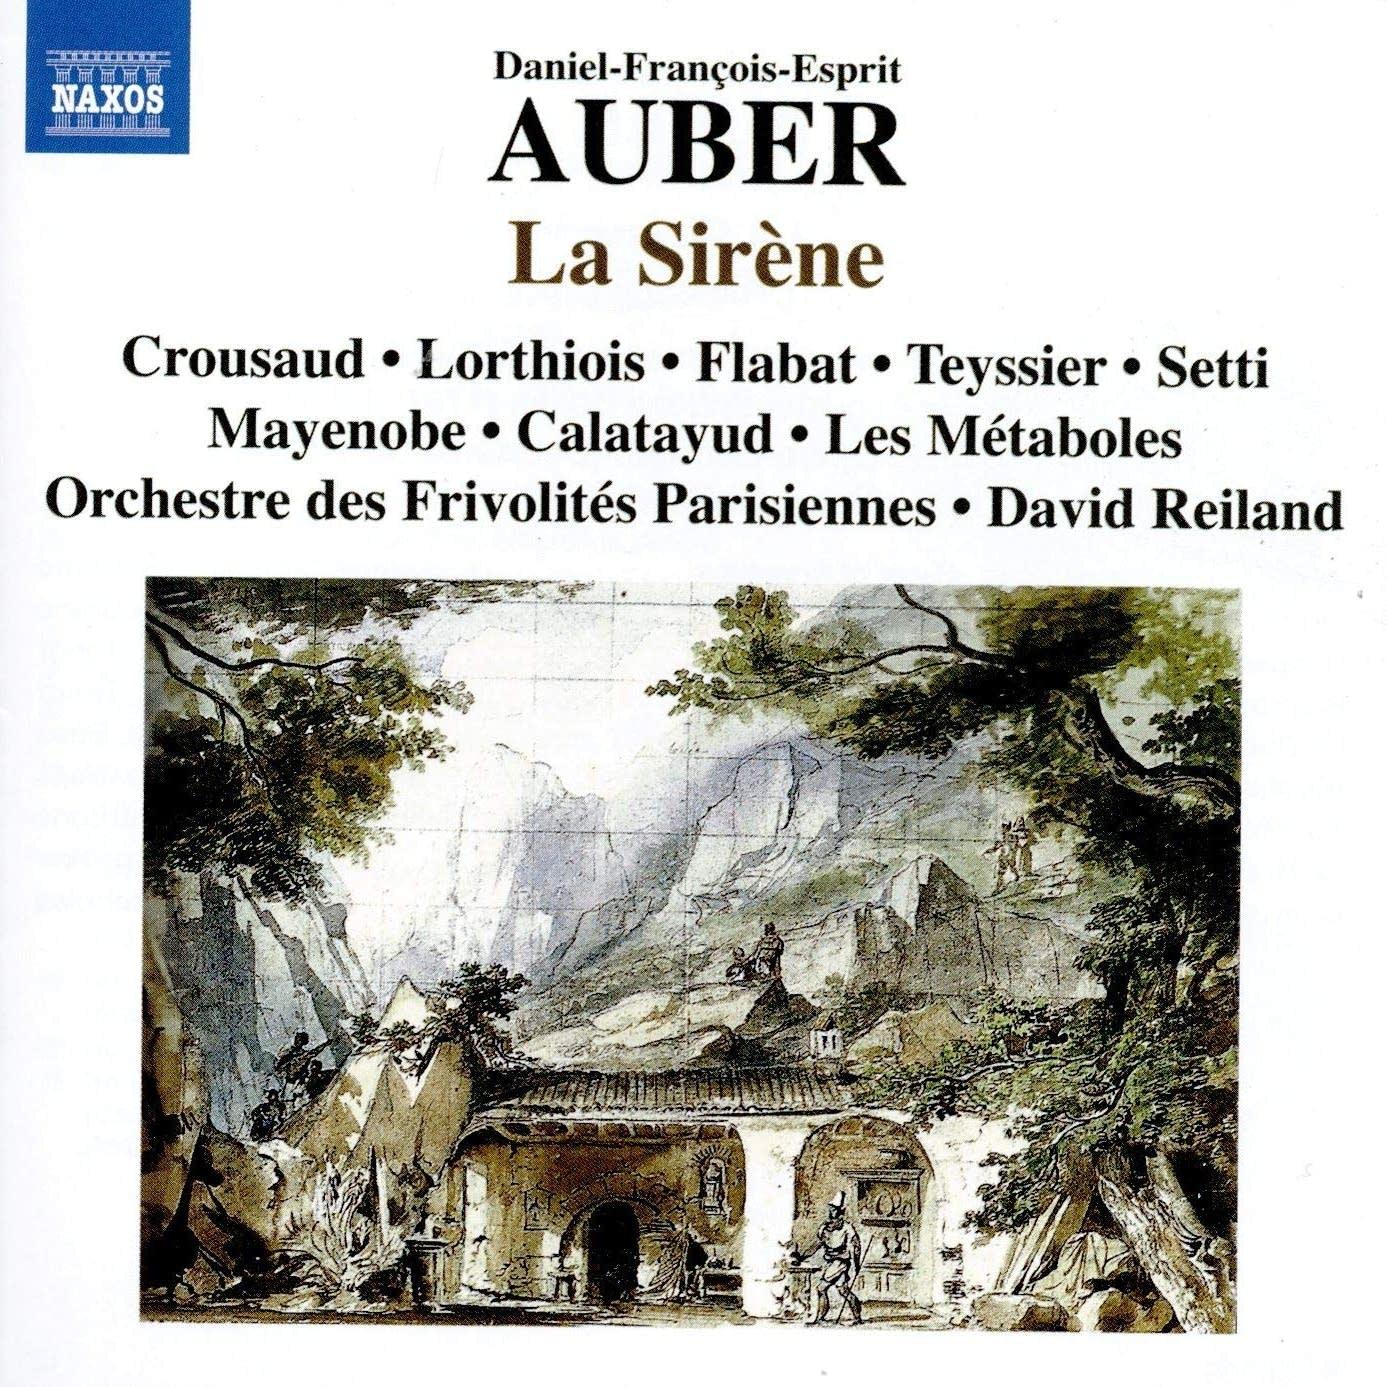 Daniel-Francois Aubert - La Sirene: Overture